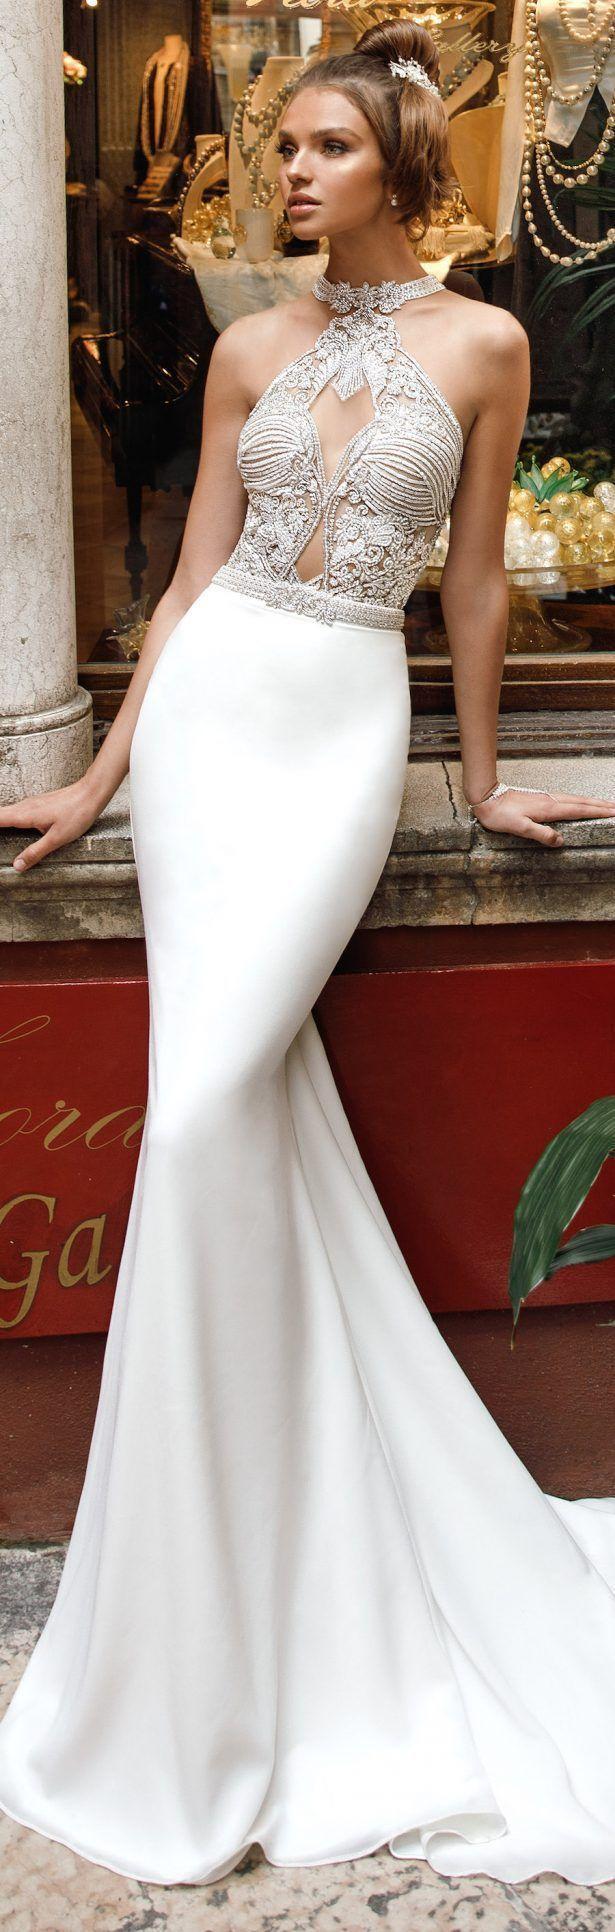 "Wedding - Wedding Dresses By Julie Vino Spring 2018 ""Venezia"" Bridal Collection"